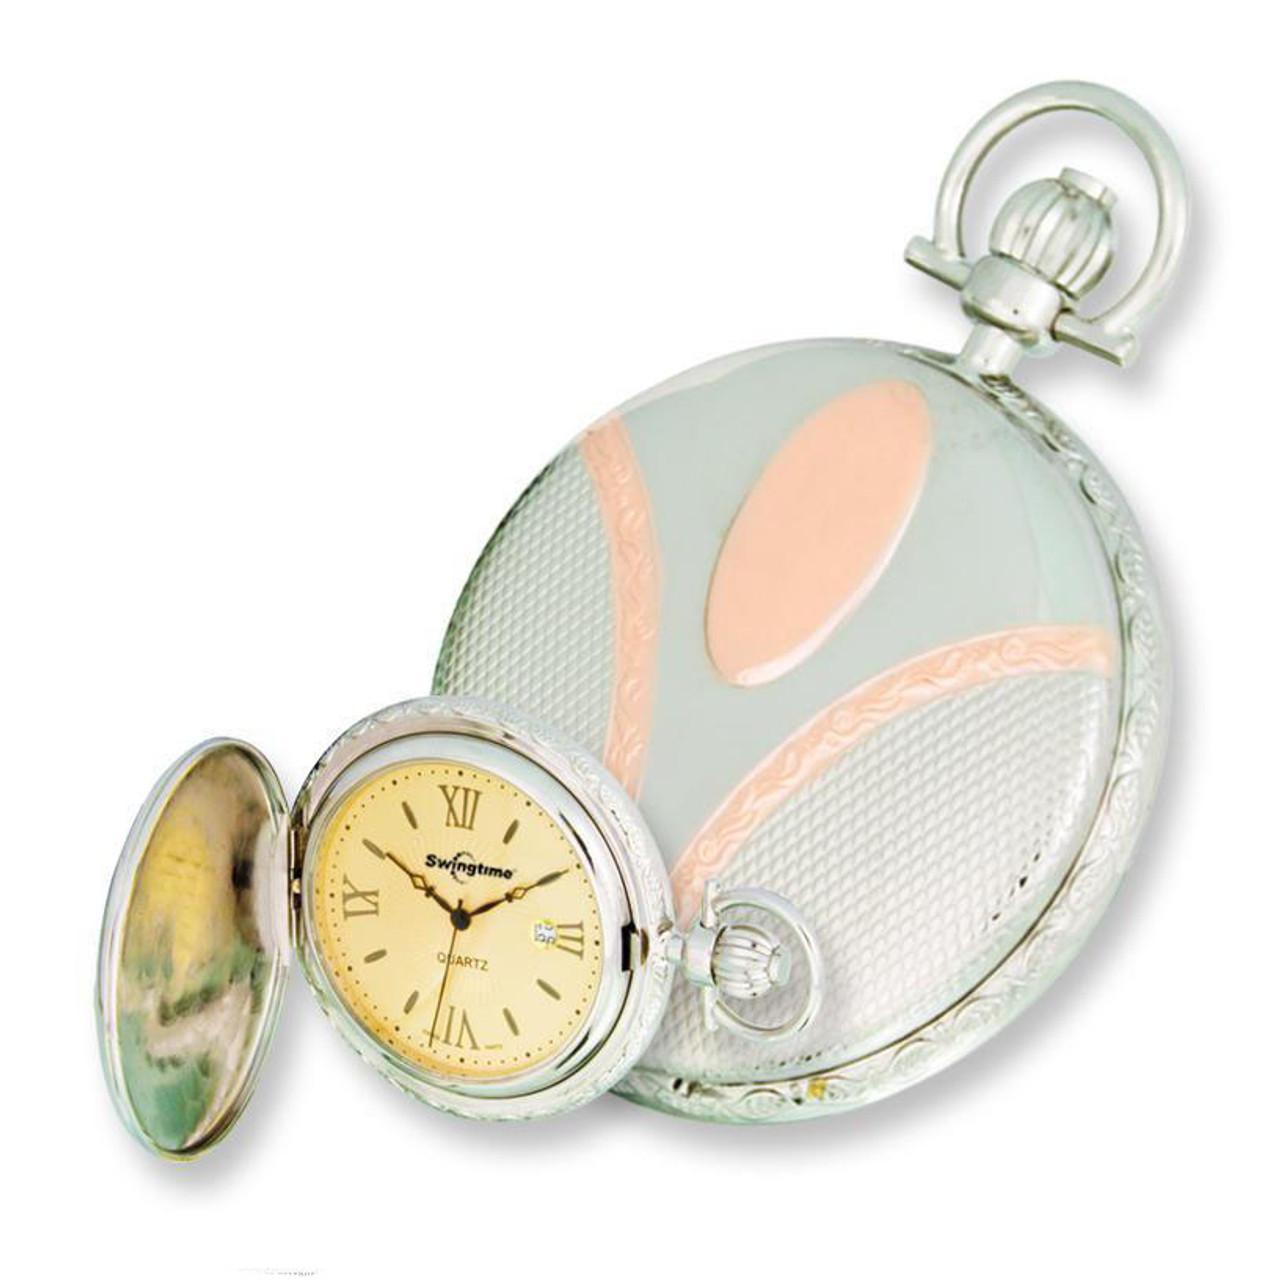 fbc18ee00 Swingtime Engravable Two Tone Brass Swiss Quartz Date Pocket Watch - The  Royal Gift Inc.